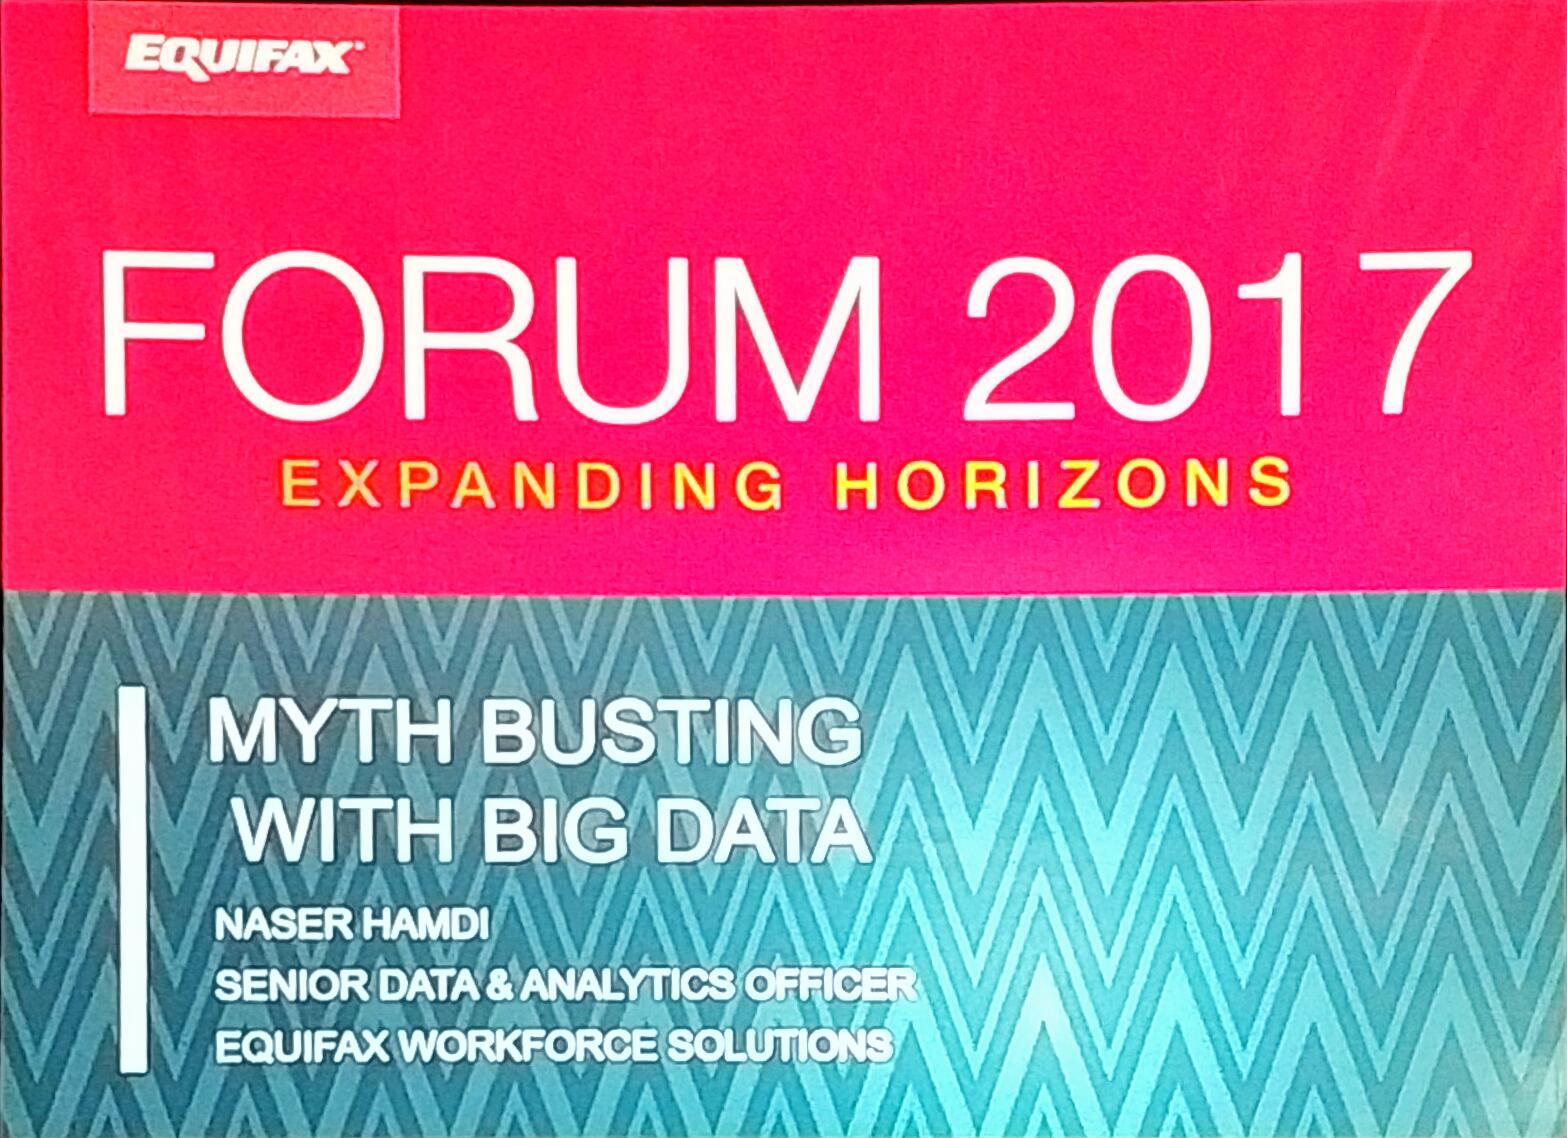 Next up -  Myth Busting with #BigData with  @nhamdi #EFXForum17 https://t.co/aojysgJOh8